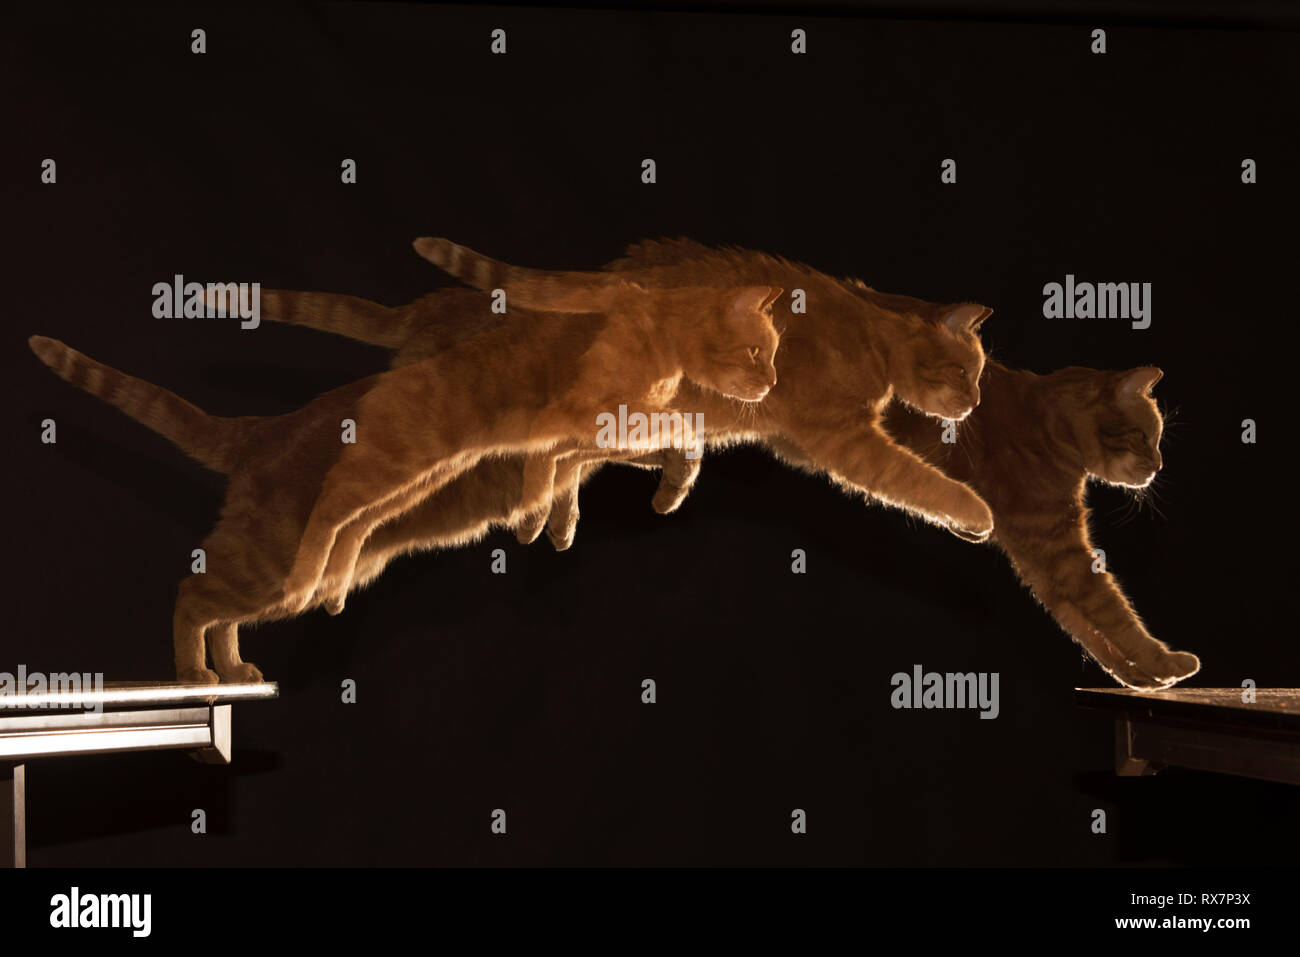 Cat Jumping Multiple Shots Ginger Cat (Ronnie), High Speed Flash, Studio, Kent UK - Stock Image